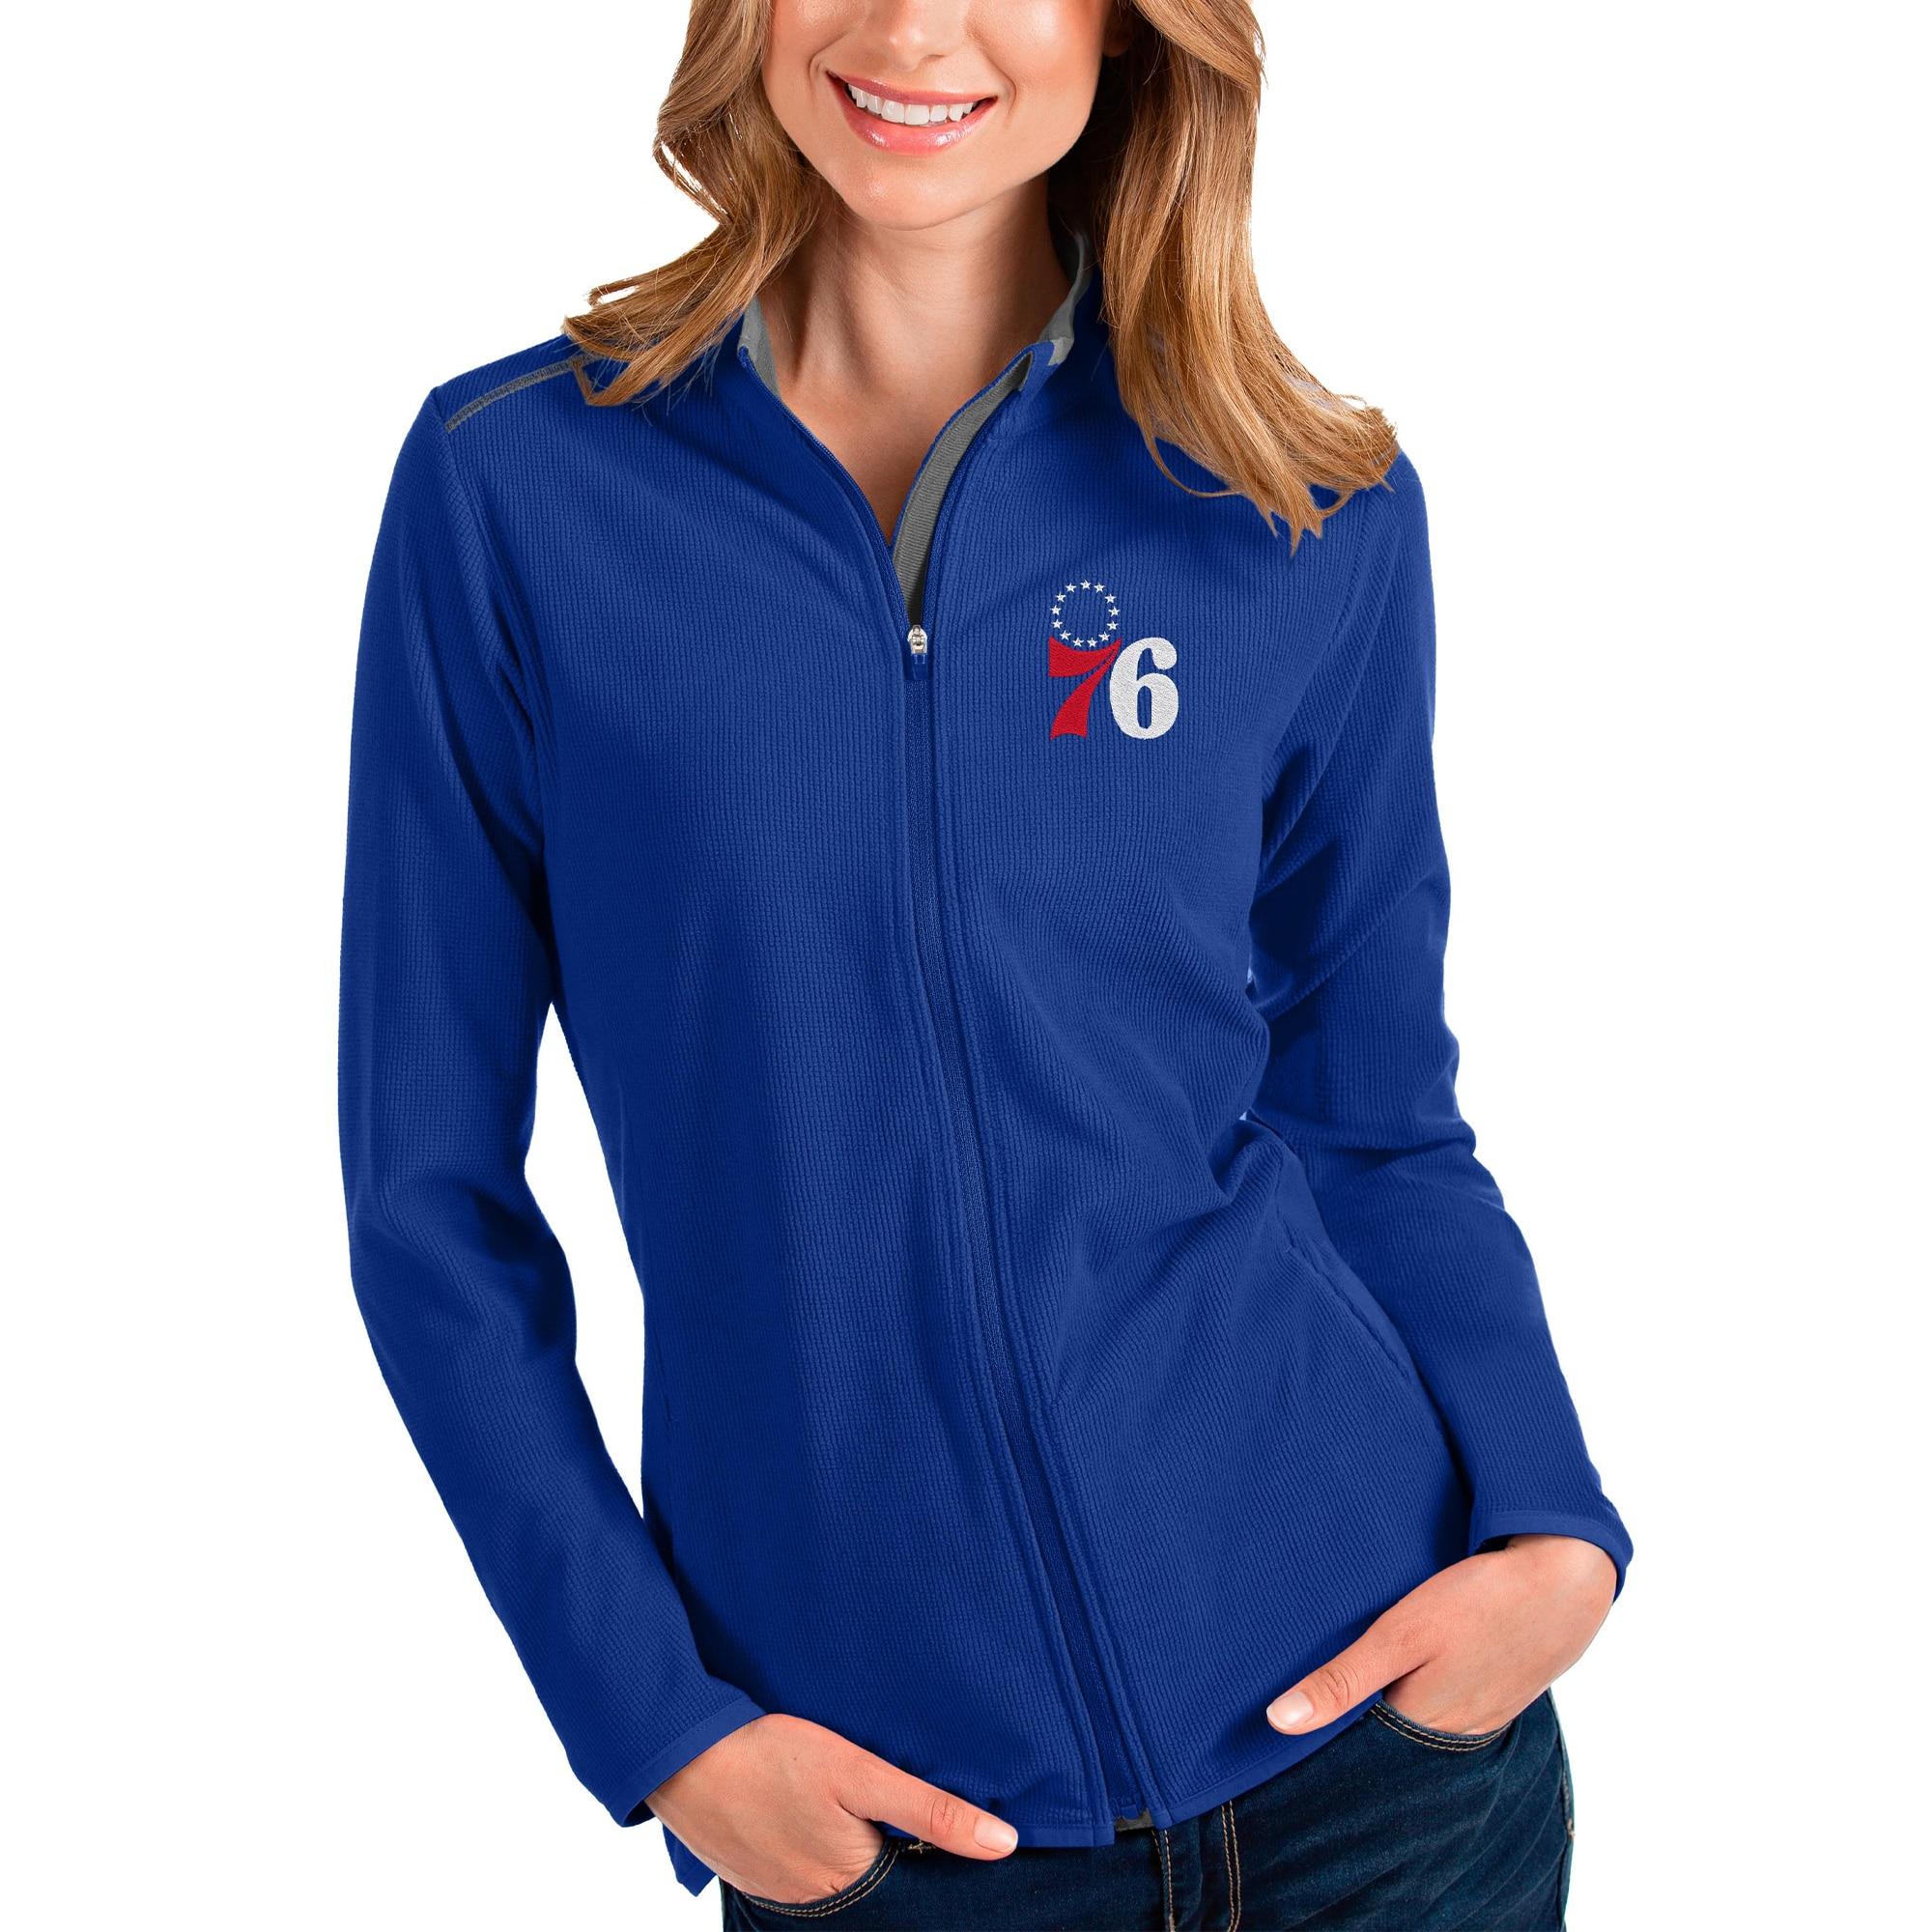 Philadelphia 76ers Antigua Women's Glacier Full-Zip Jacket - Royal/Gray